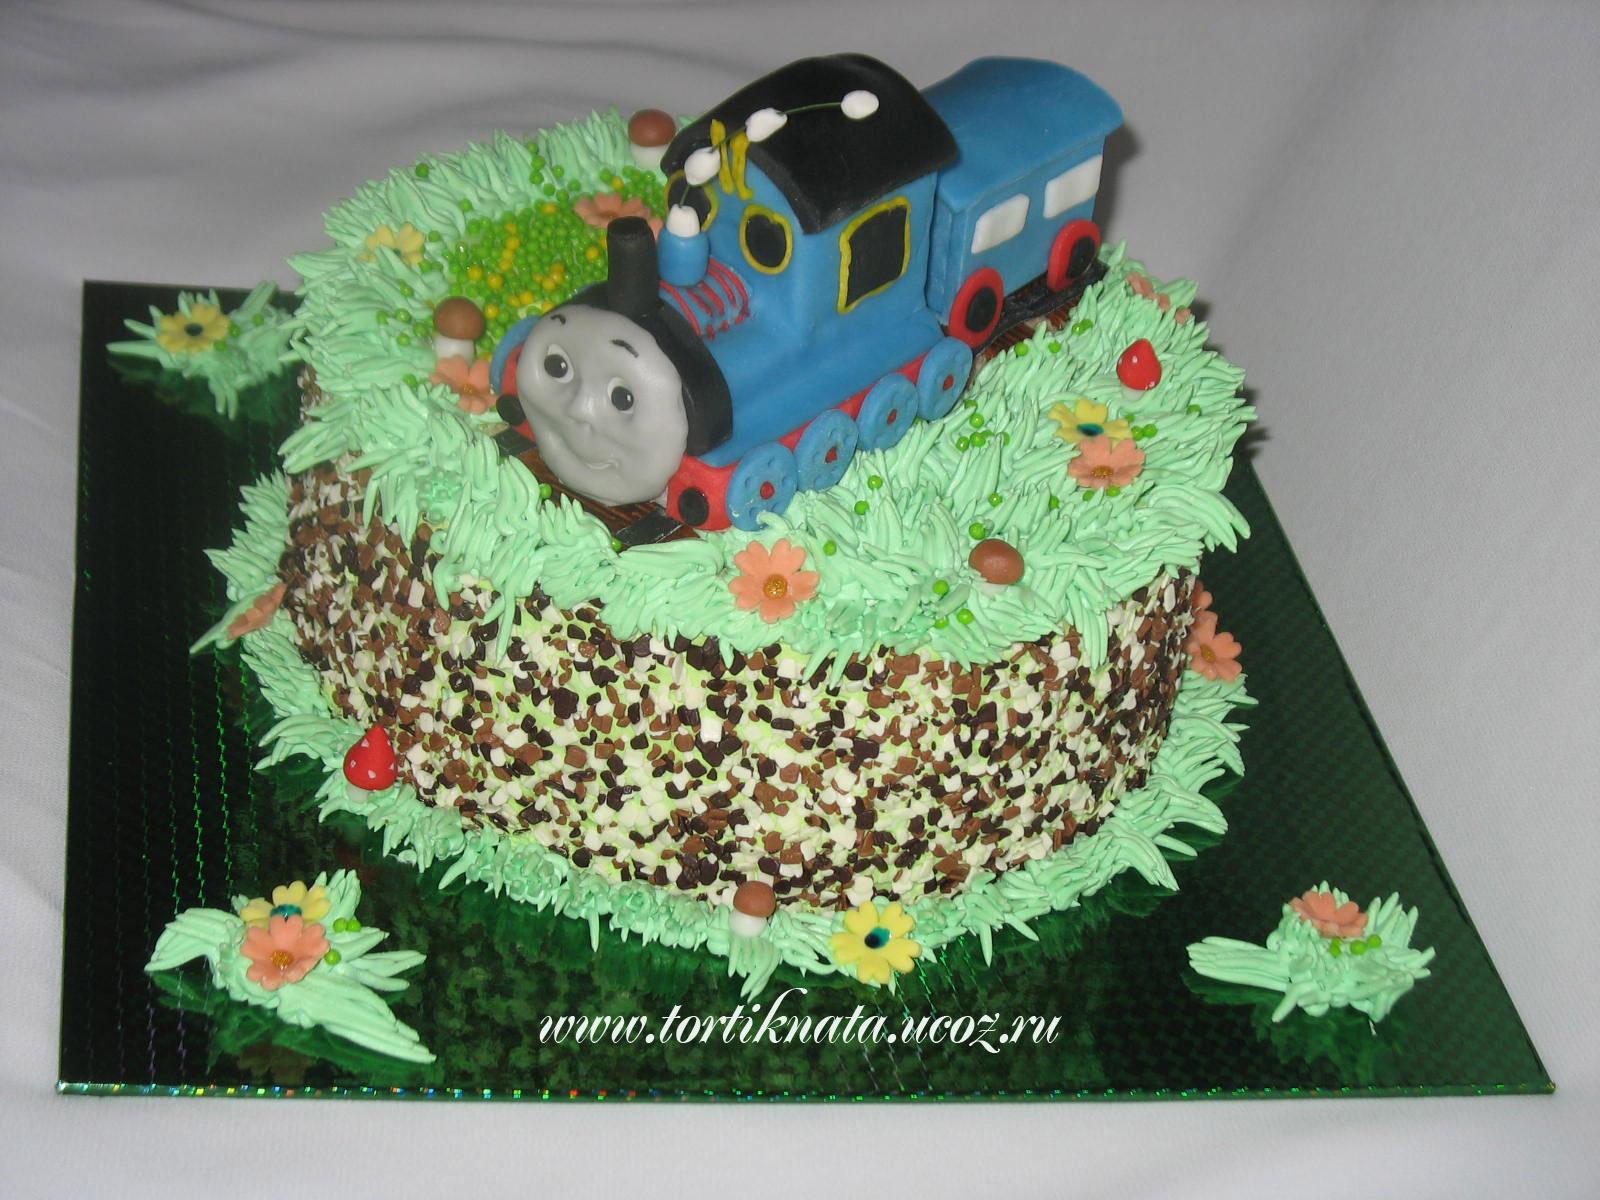 Торт паровозик своими руками рецепт с фото